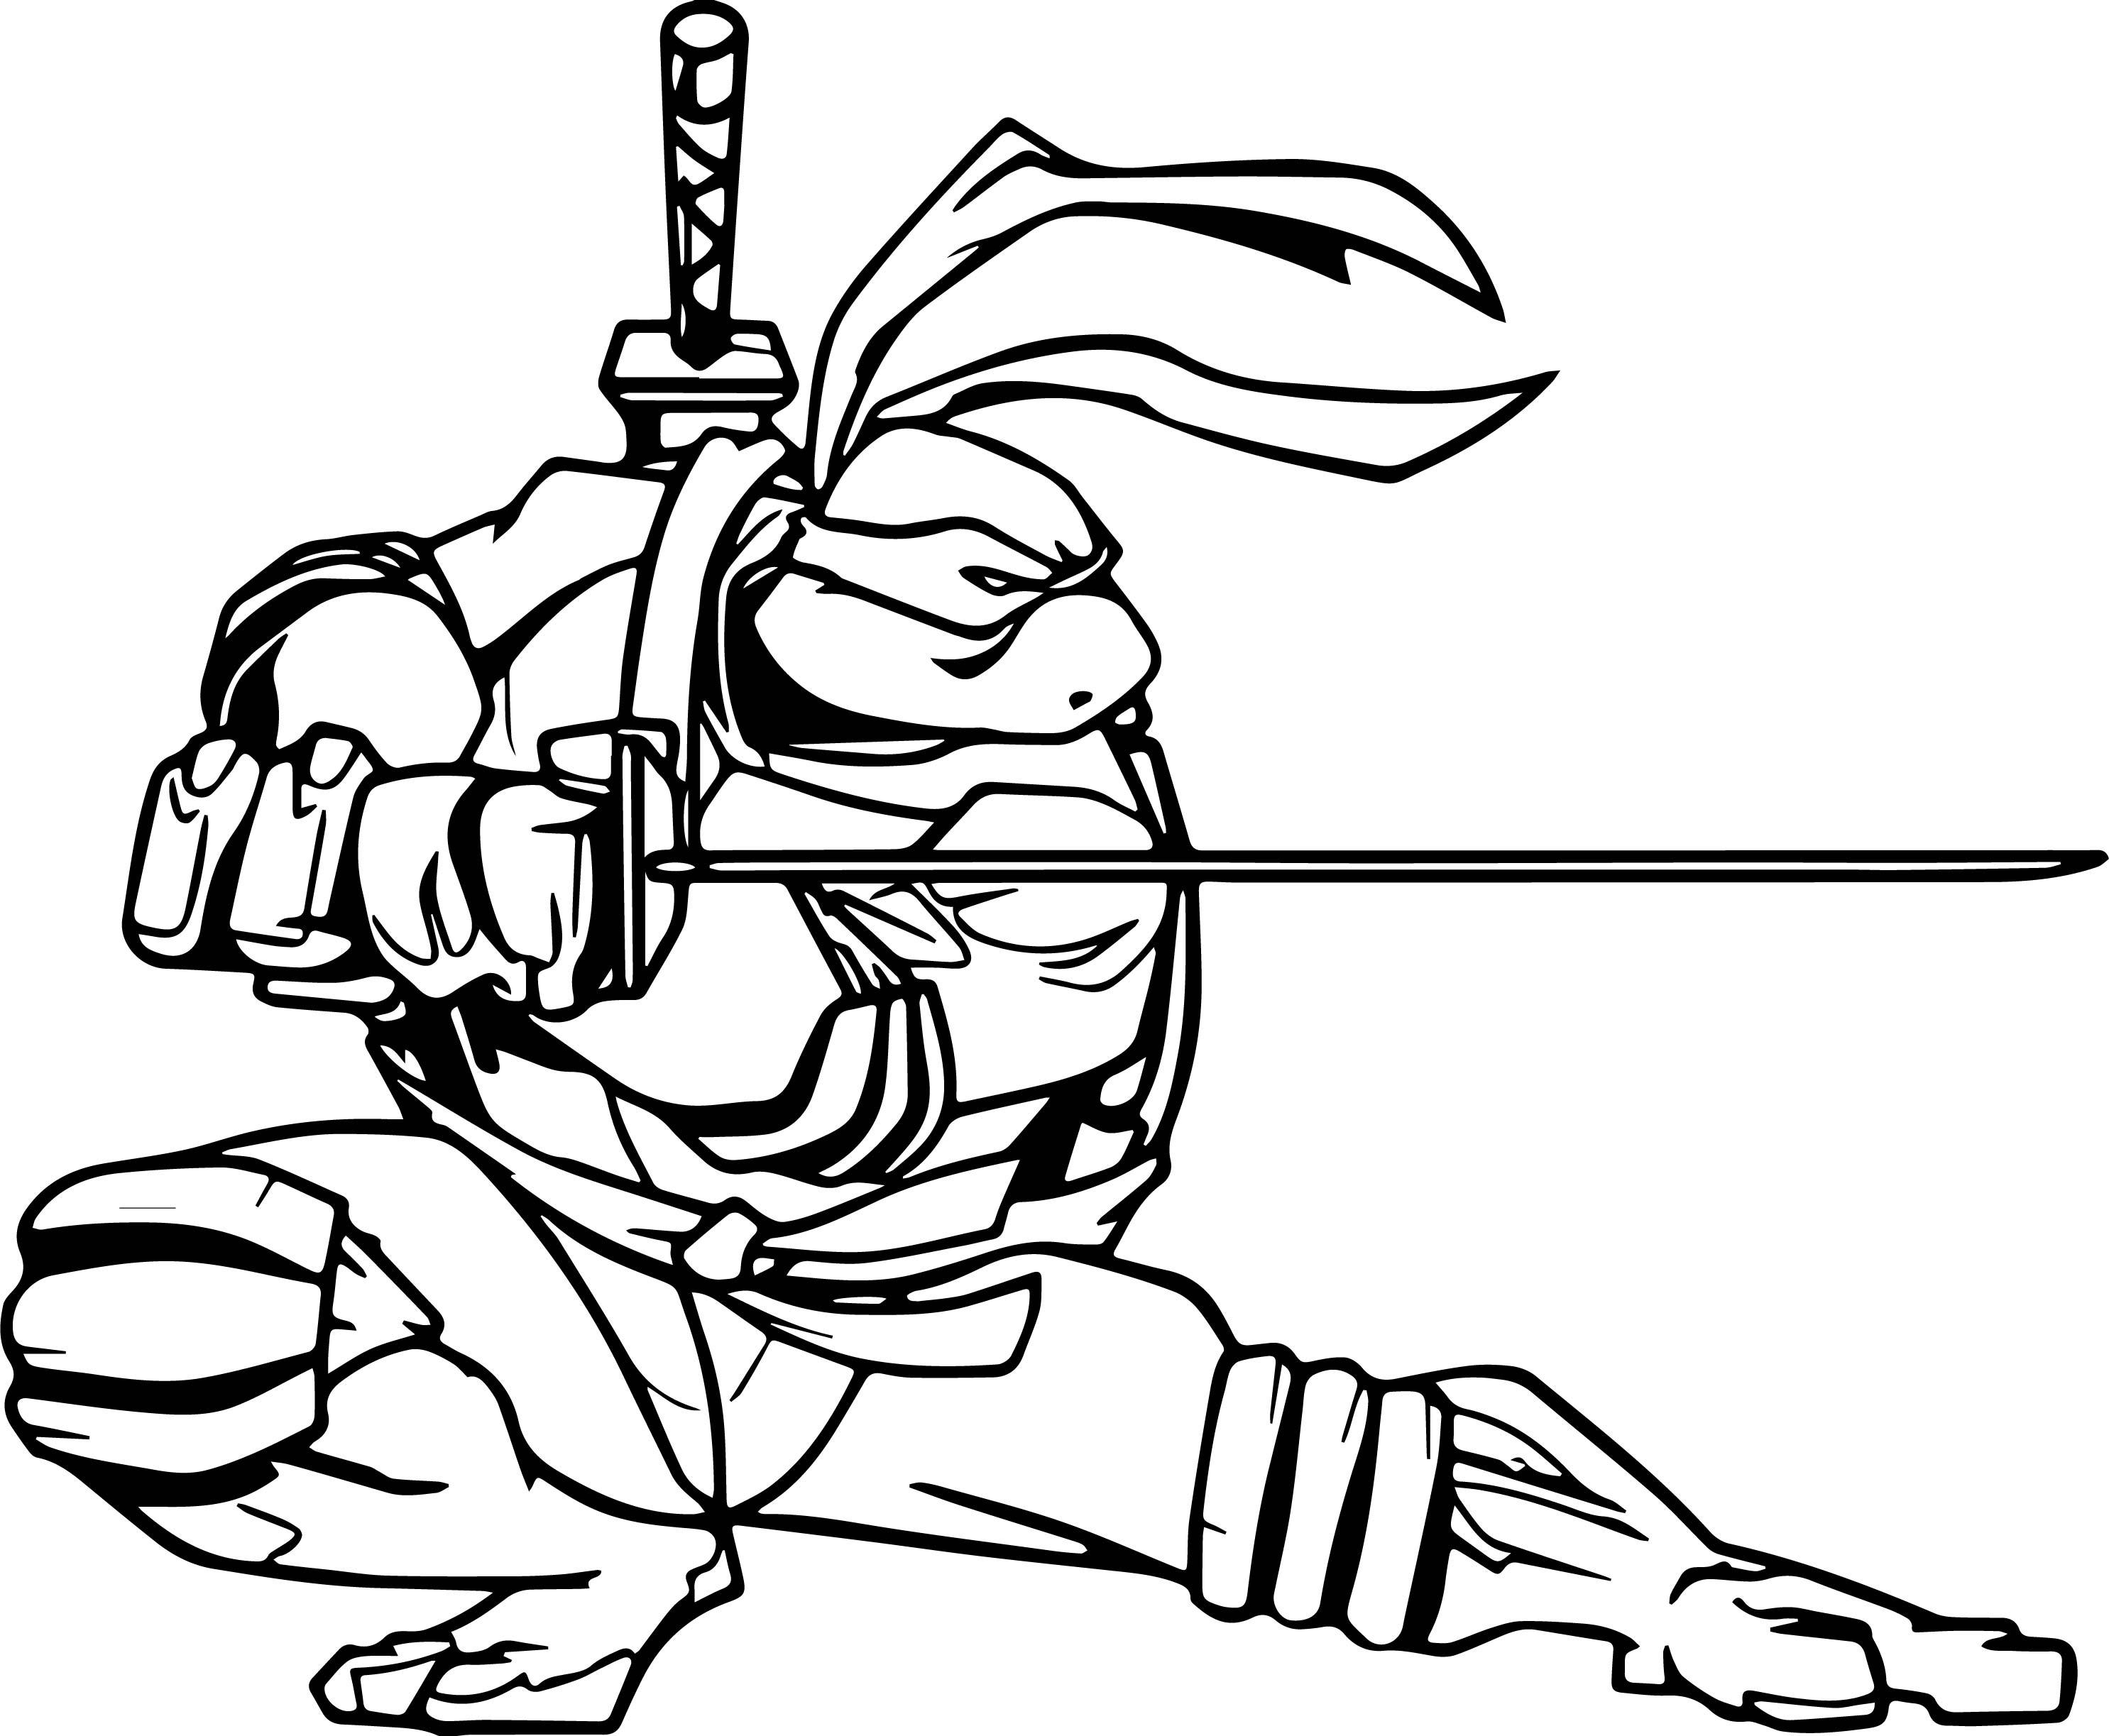 Ninja Turtles Face coloring page  Free Printable